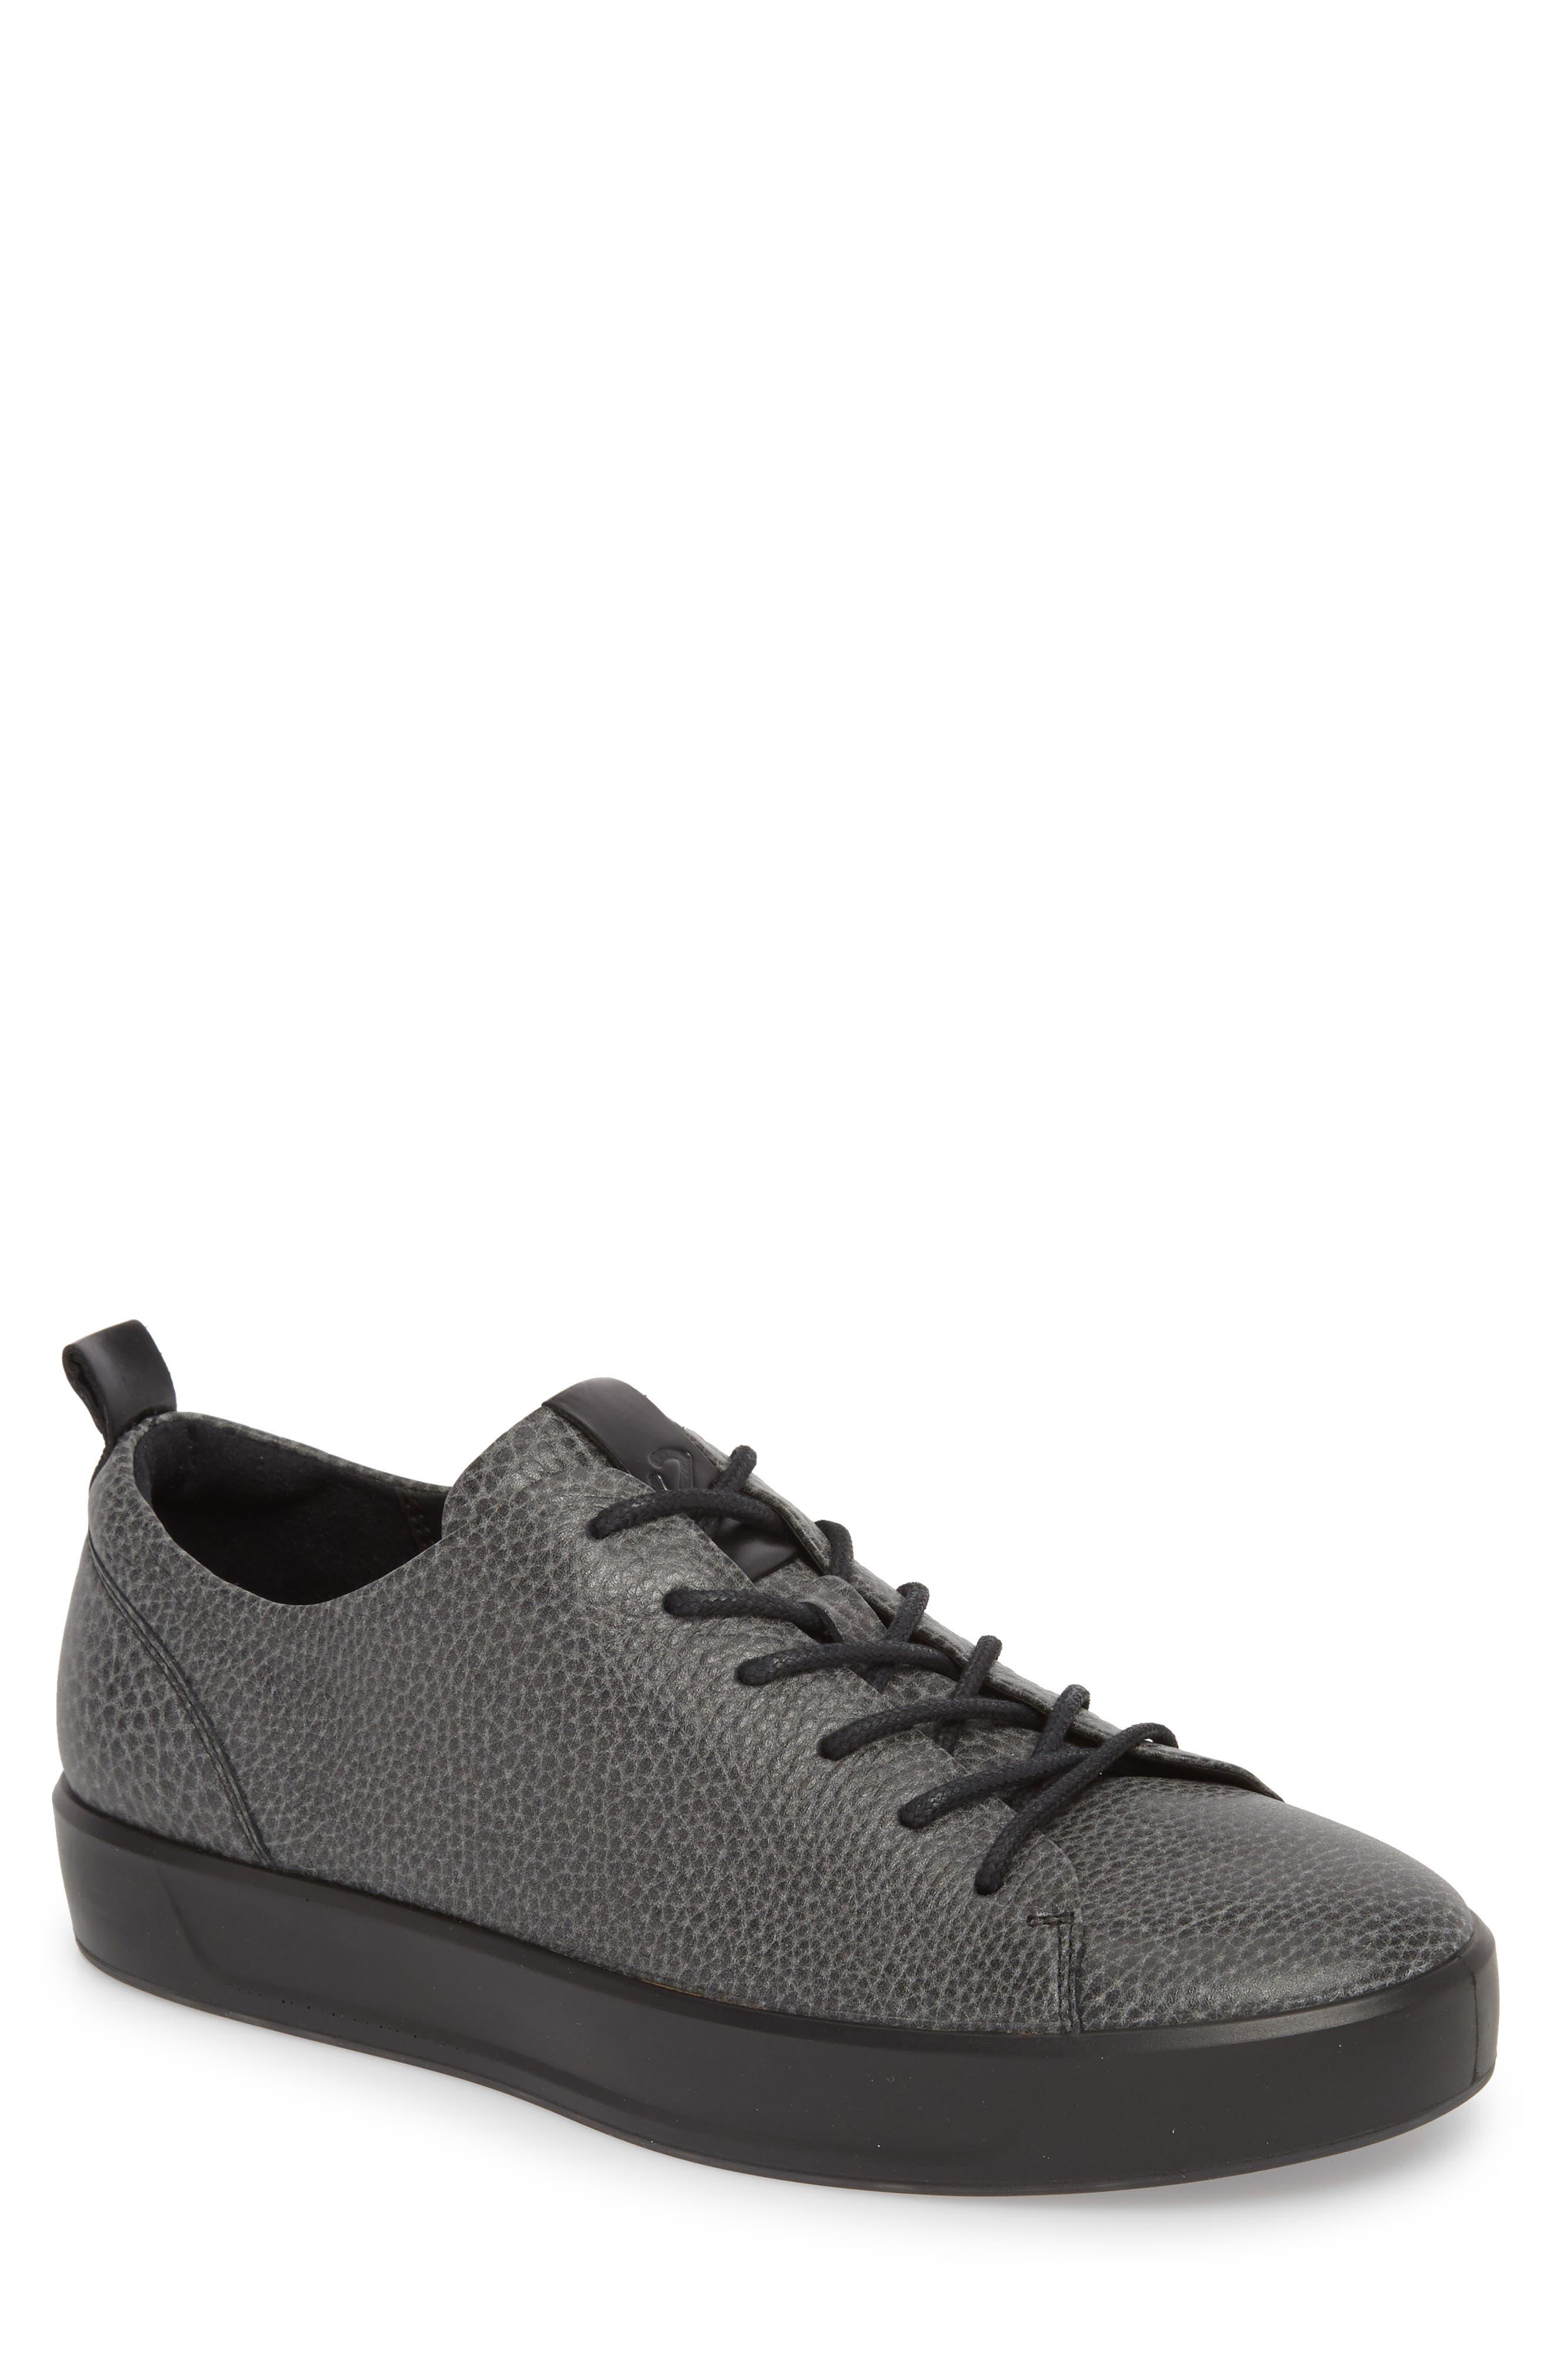 Soft 8 Tie II Low Top Sneaker,                             Main thumbnail 1, color,                             BLACK